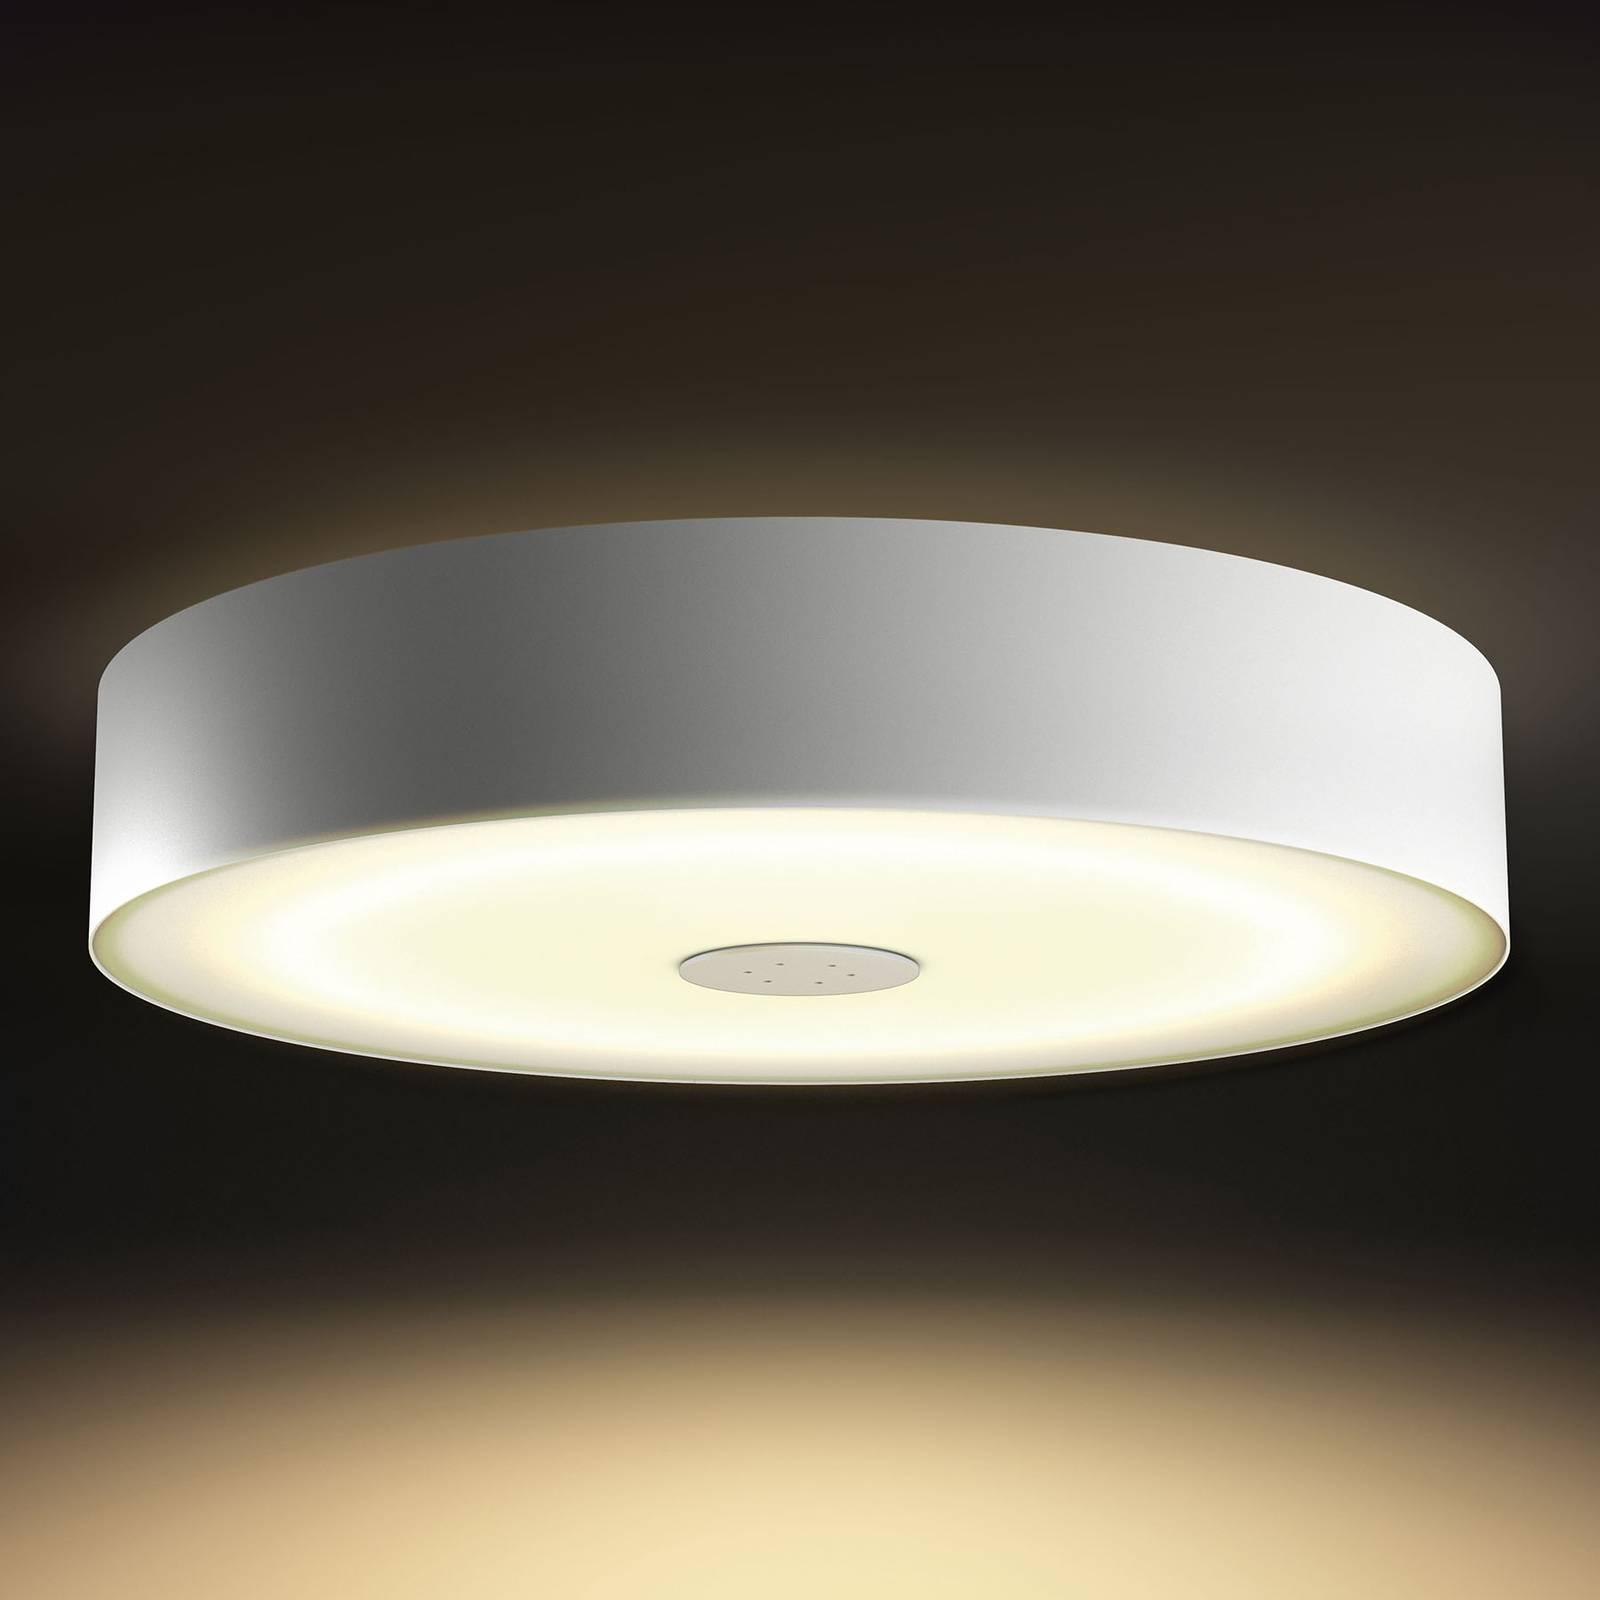 Philips Hue White Ambiance Fair plafondlamp wit